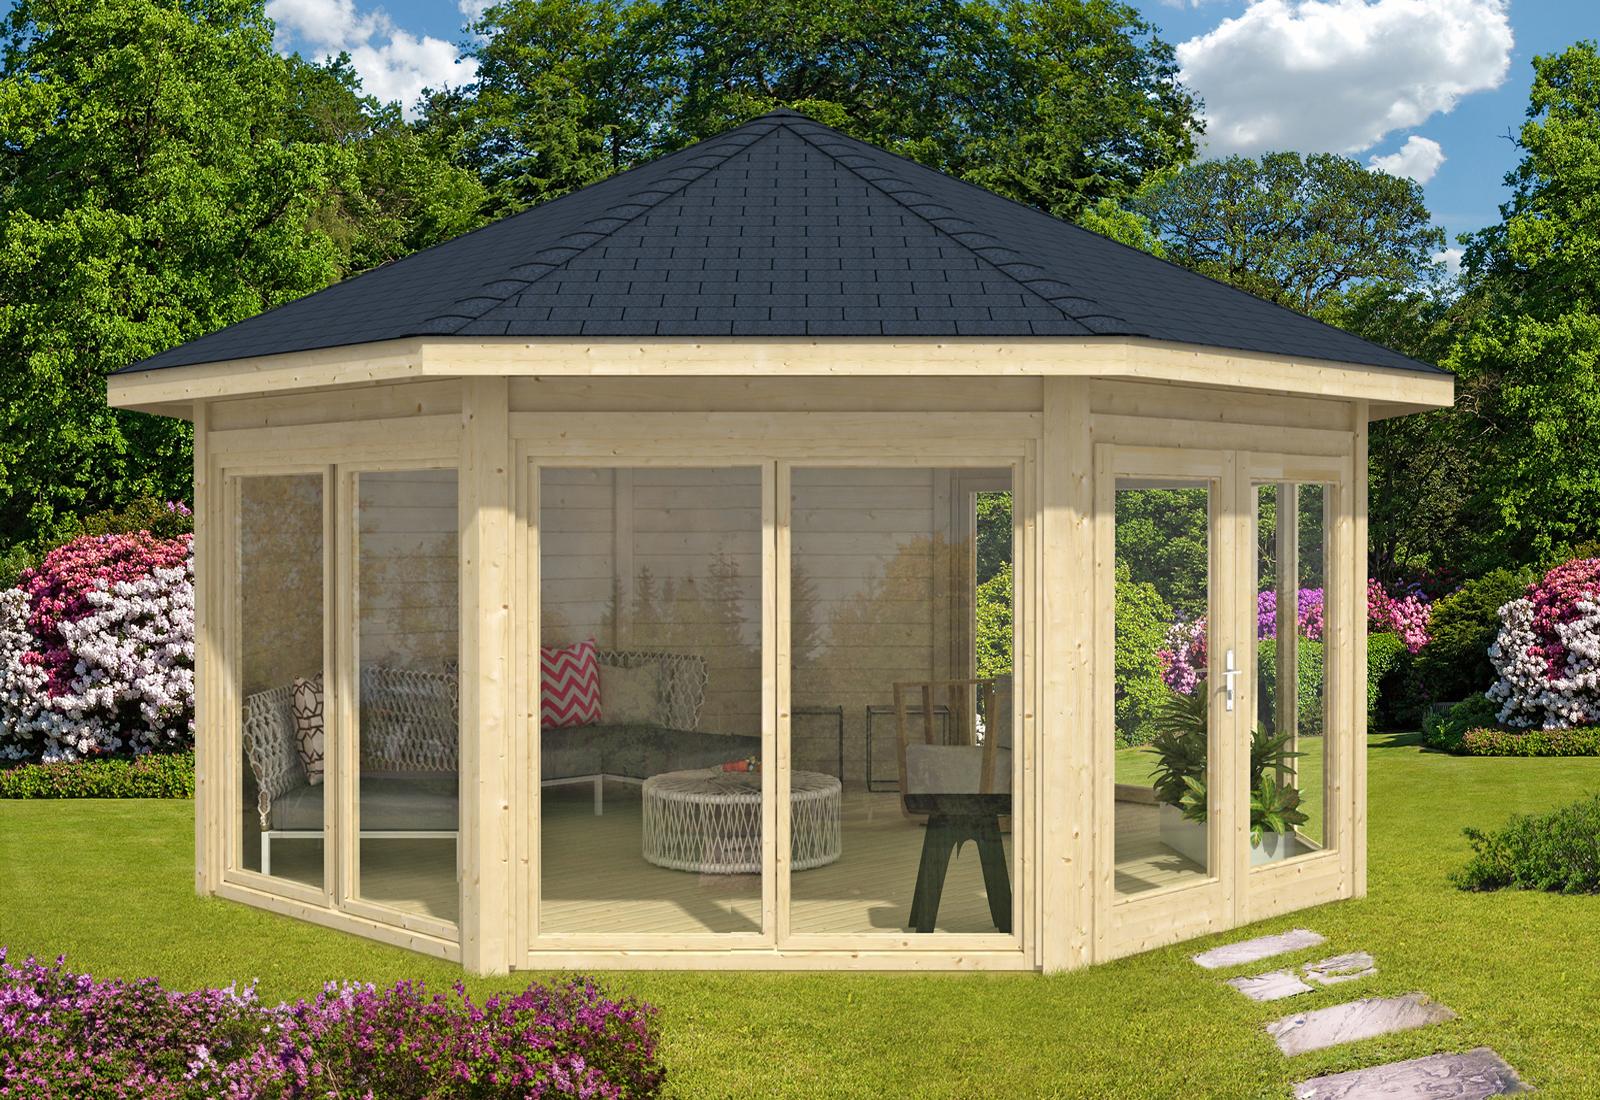 Full Size of Garten Pavillon 3x3 Holz Baugenehmigung Pavilion Rund Pavillion Metall / Metallpavillon Sun Antik Kupfer Look Glas Kaufen Gartenpavillon Modell Rgen Mit Vier Garten Garten Pavillion